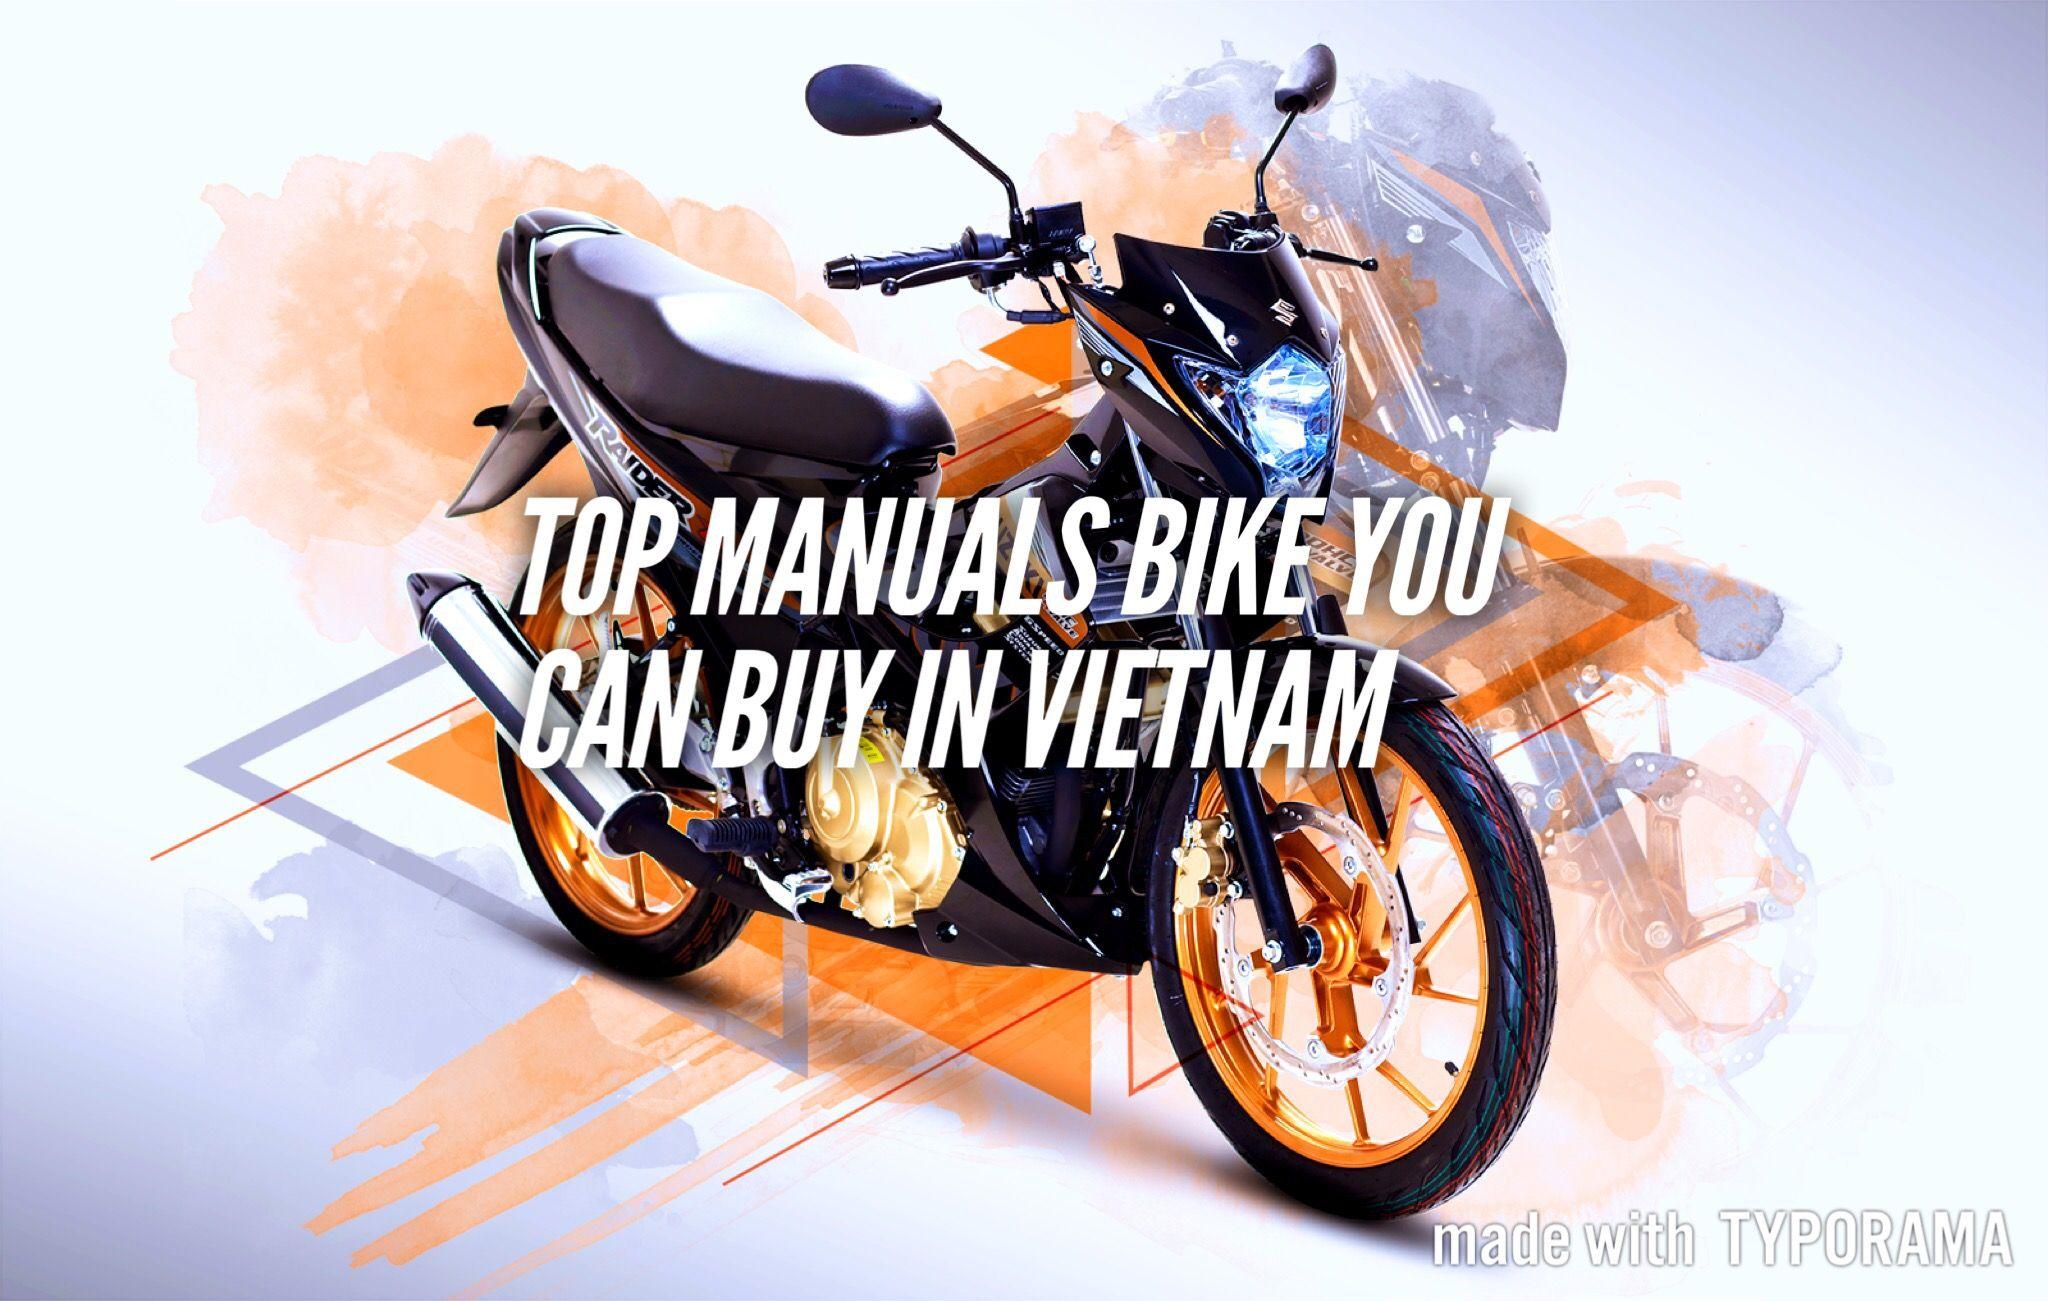 Top Local Manual Motorbikes Below 100 Million Vnd